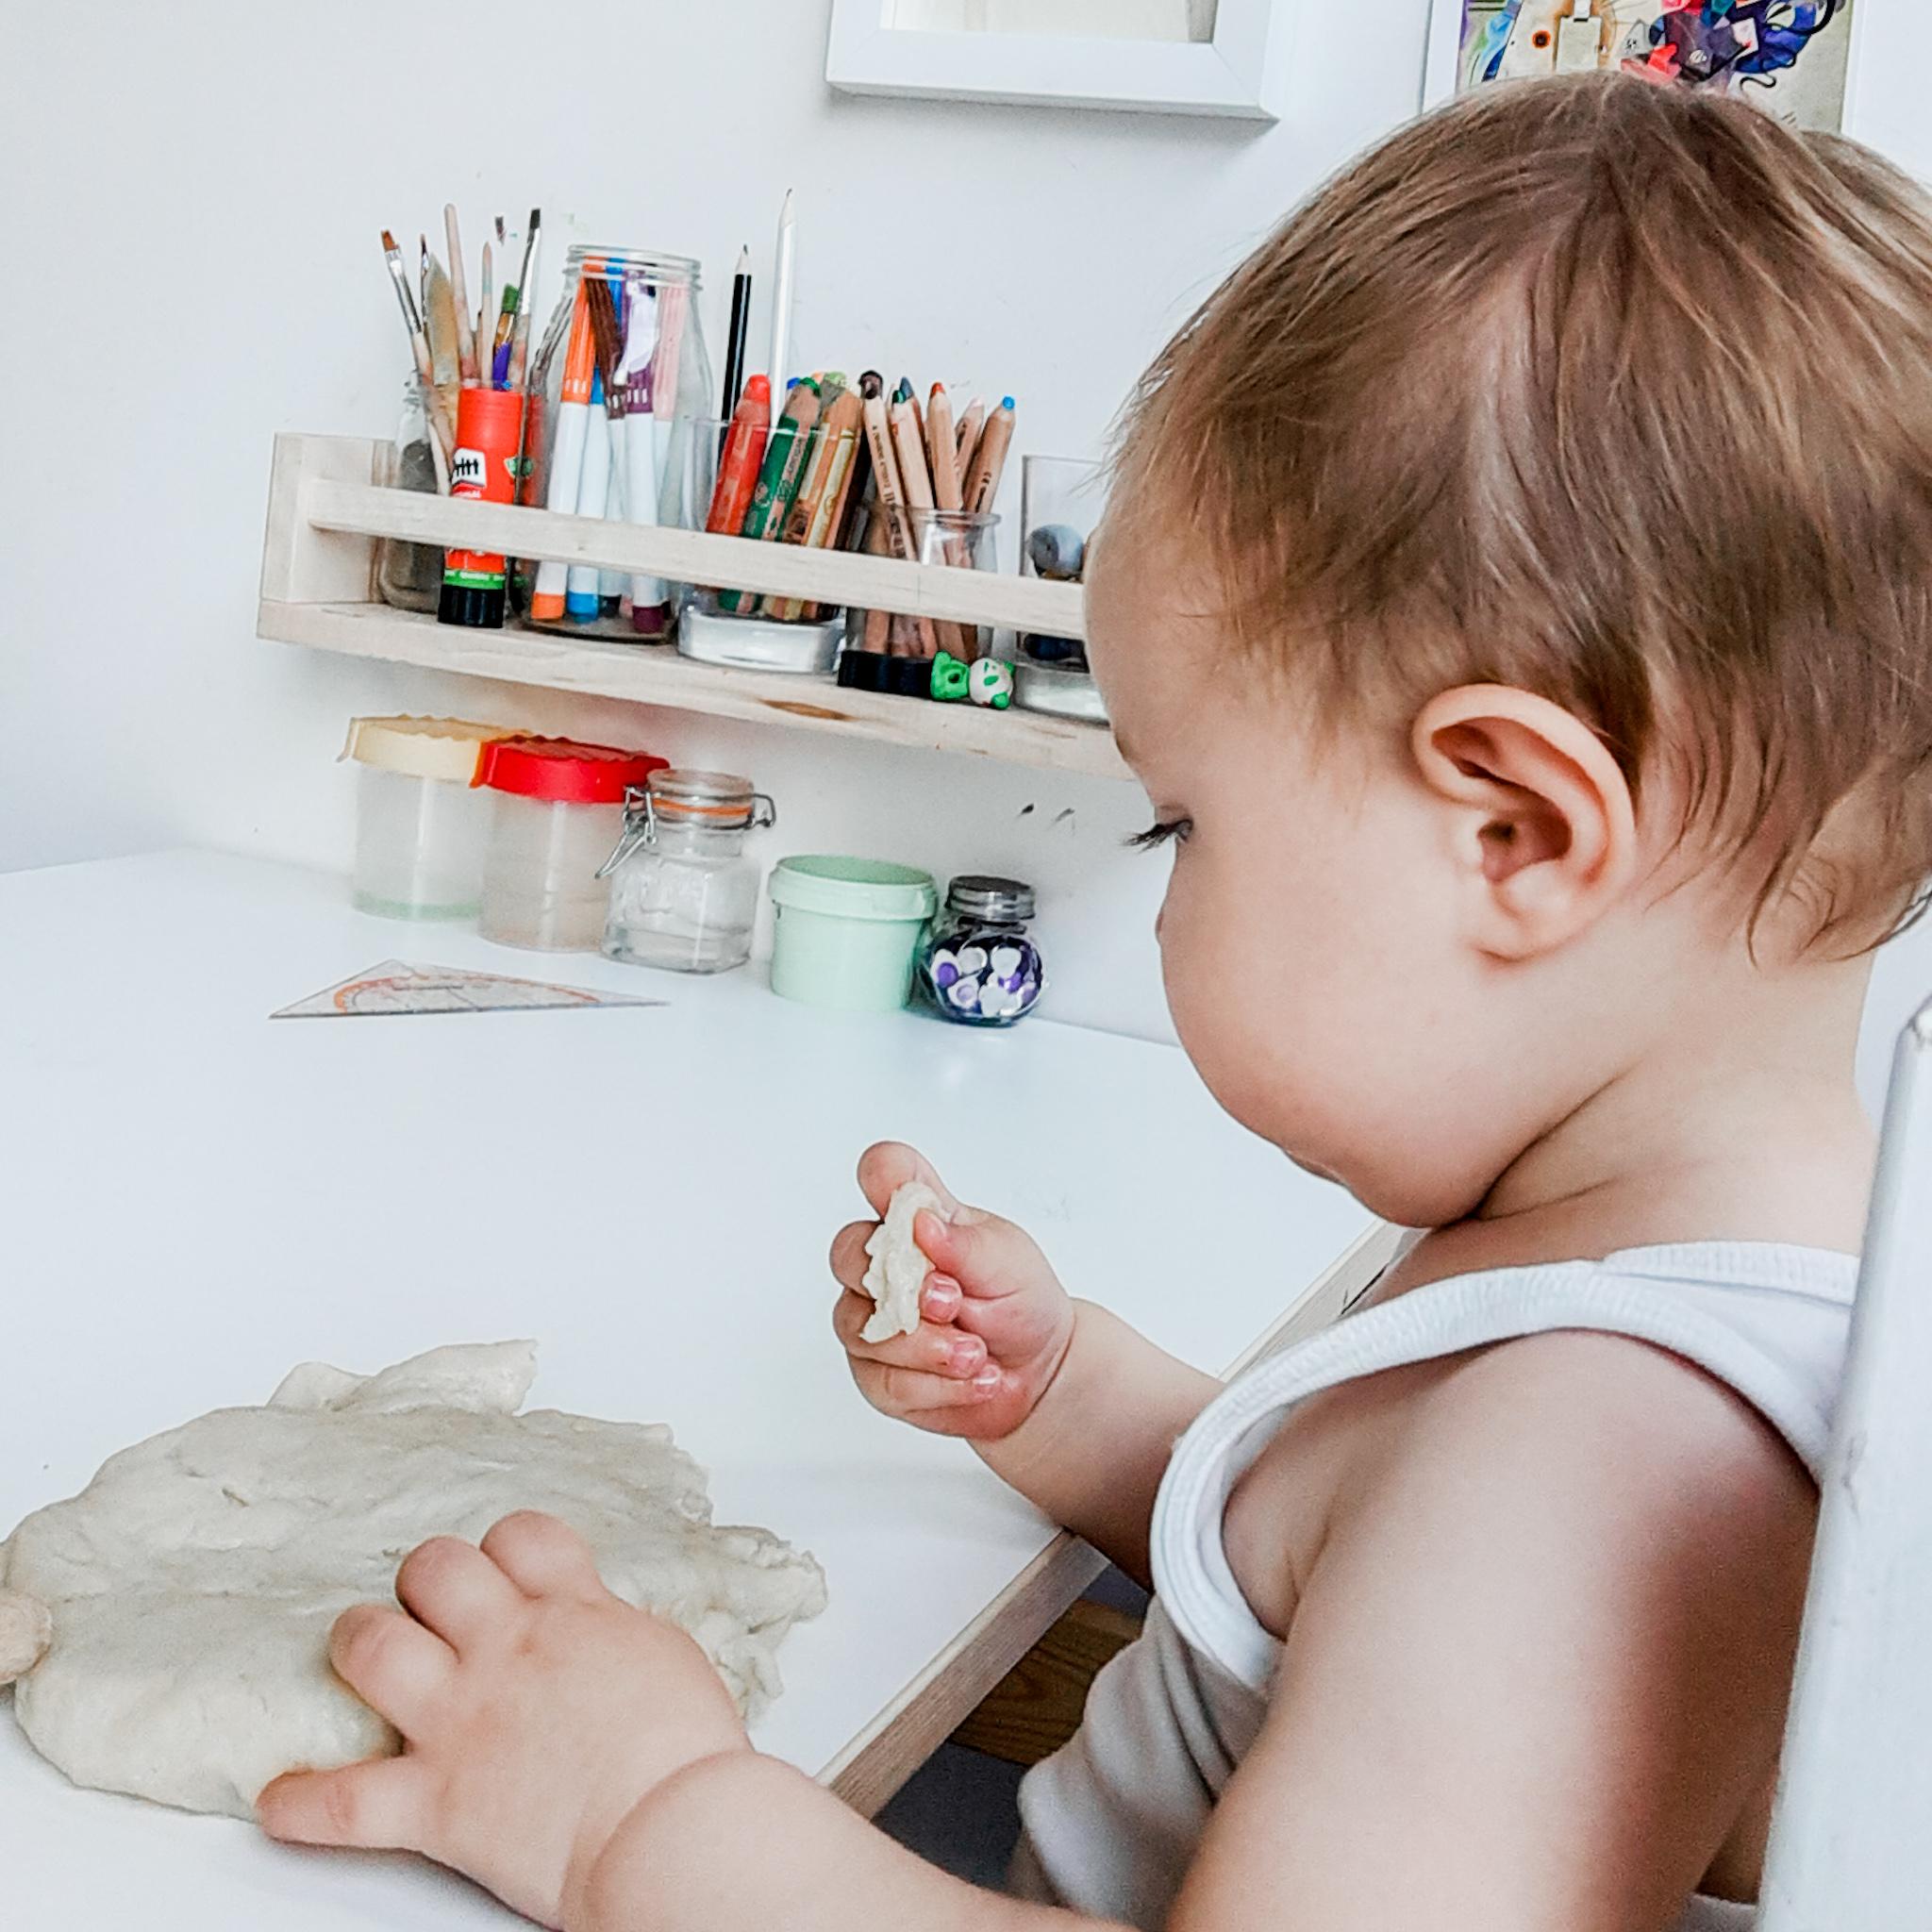 Babyproof plasticine – baby week 40